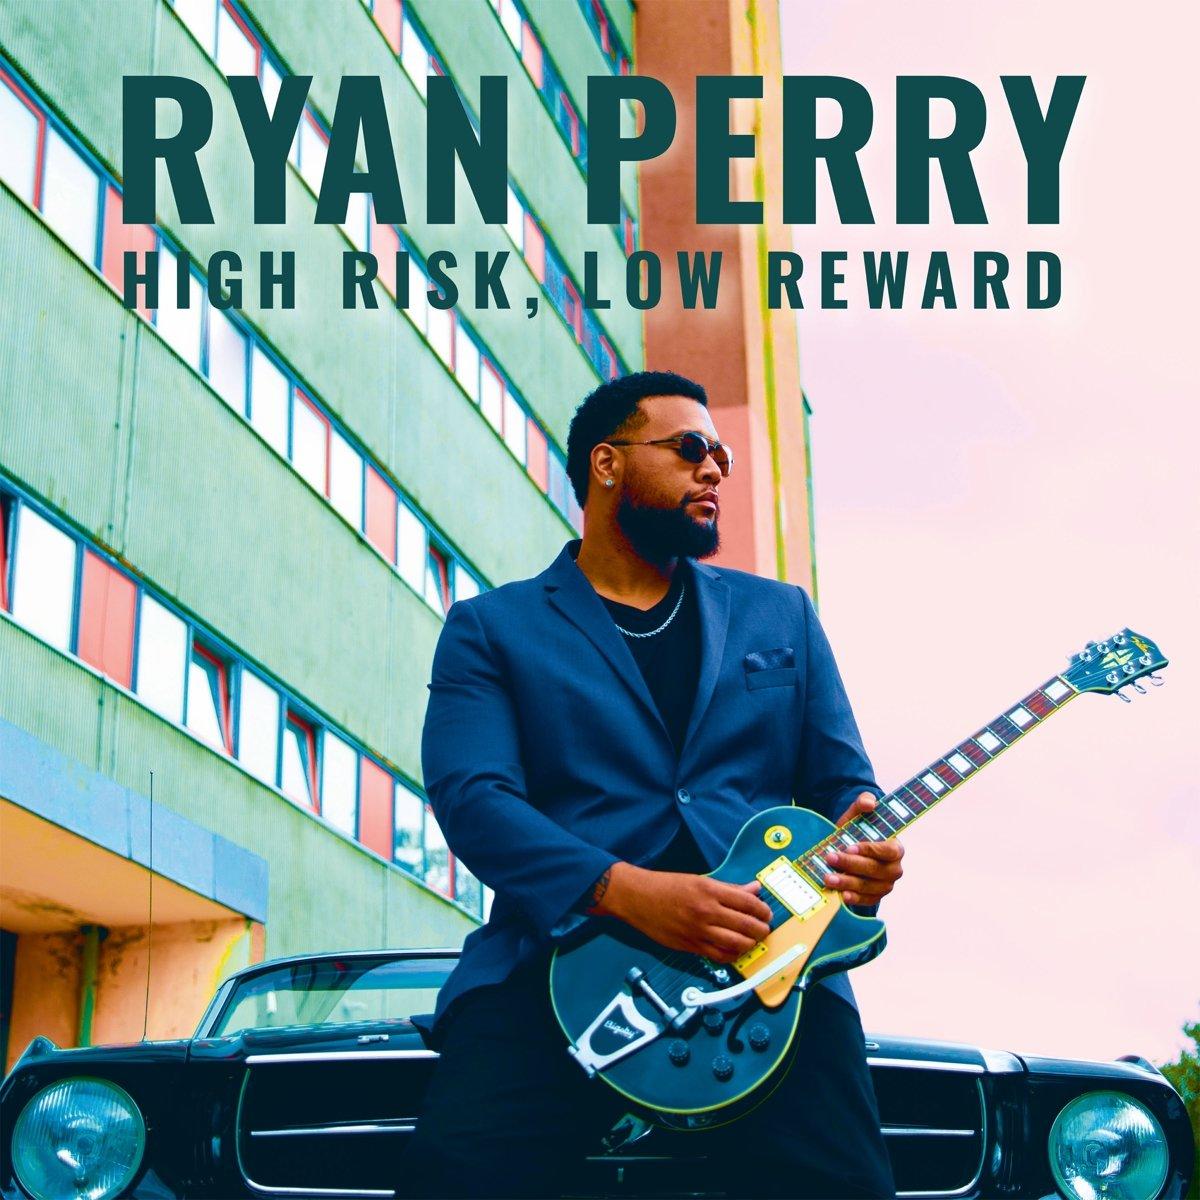 Ryan Perry High Risk Low Reward